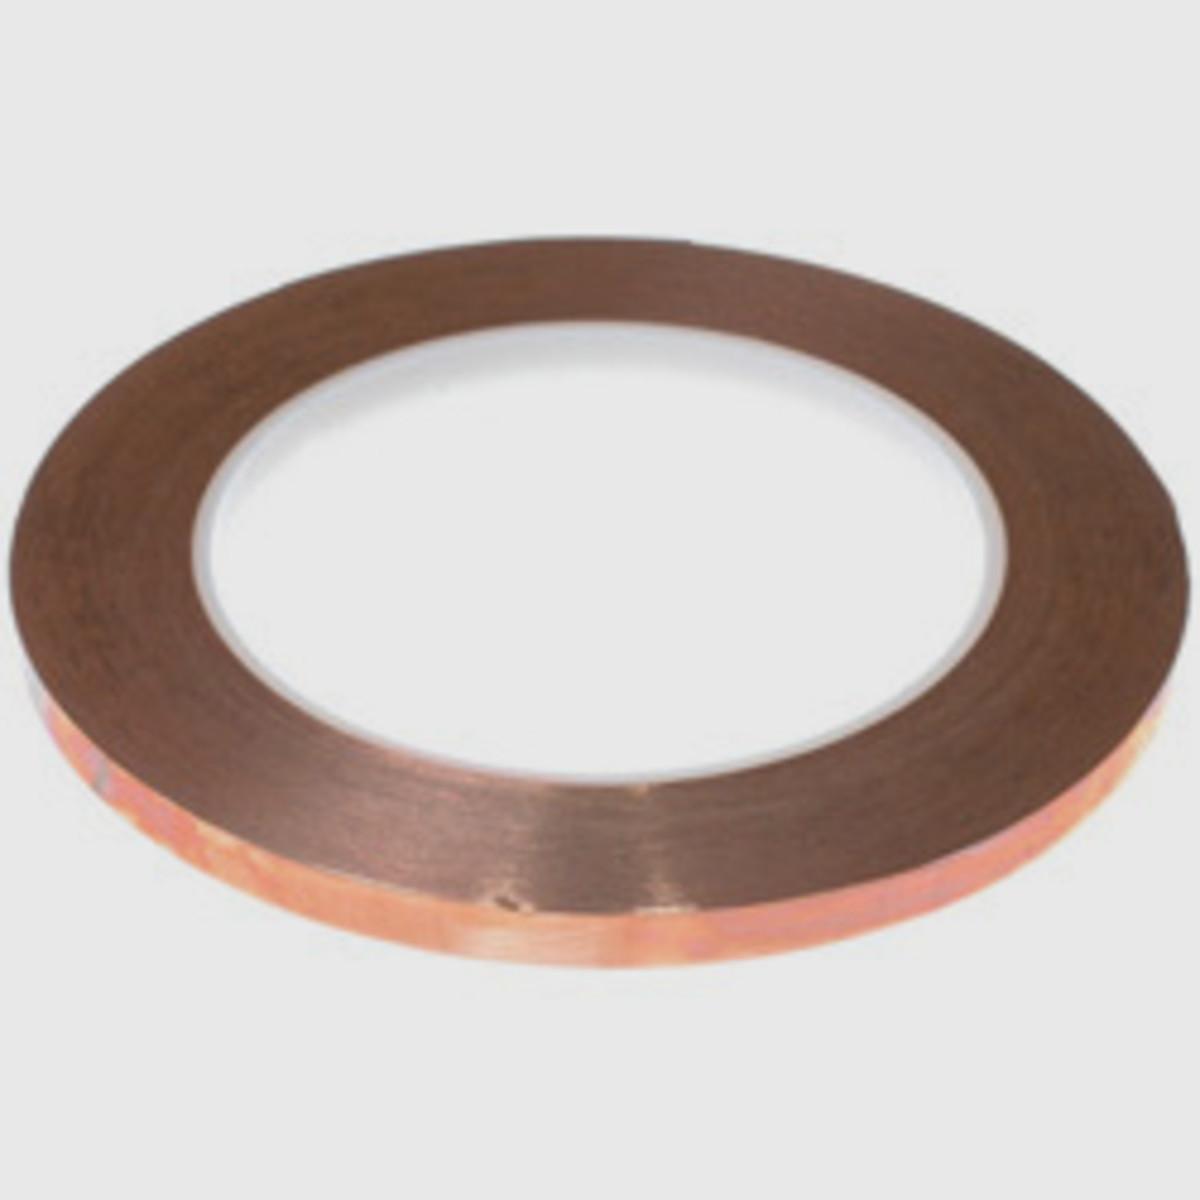 Copper foil - several different types, black backed, silver back, copper backed as well as different widths.